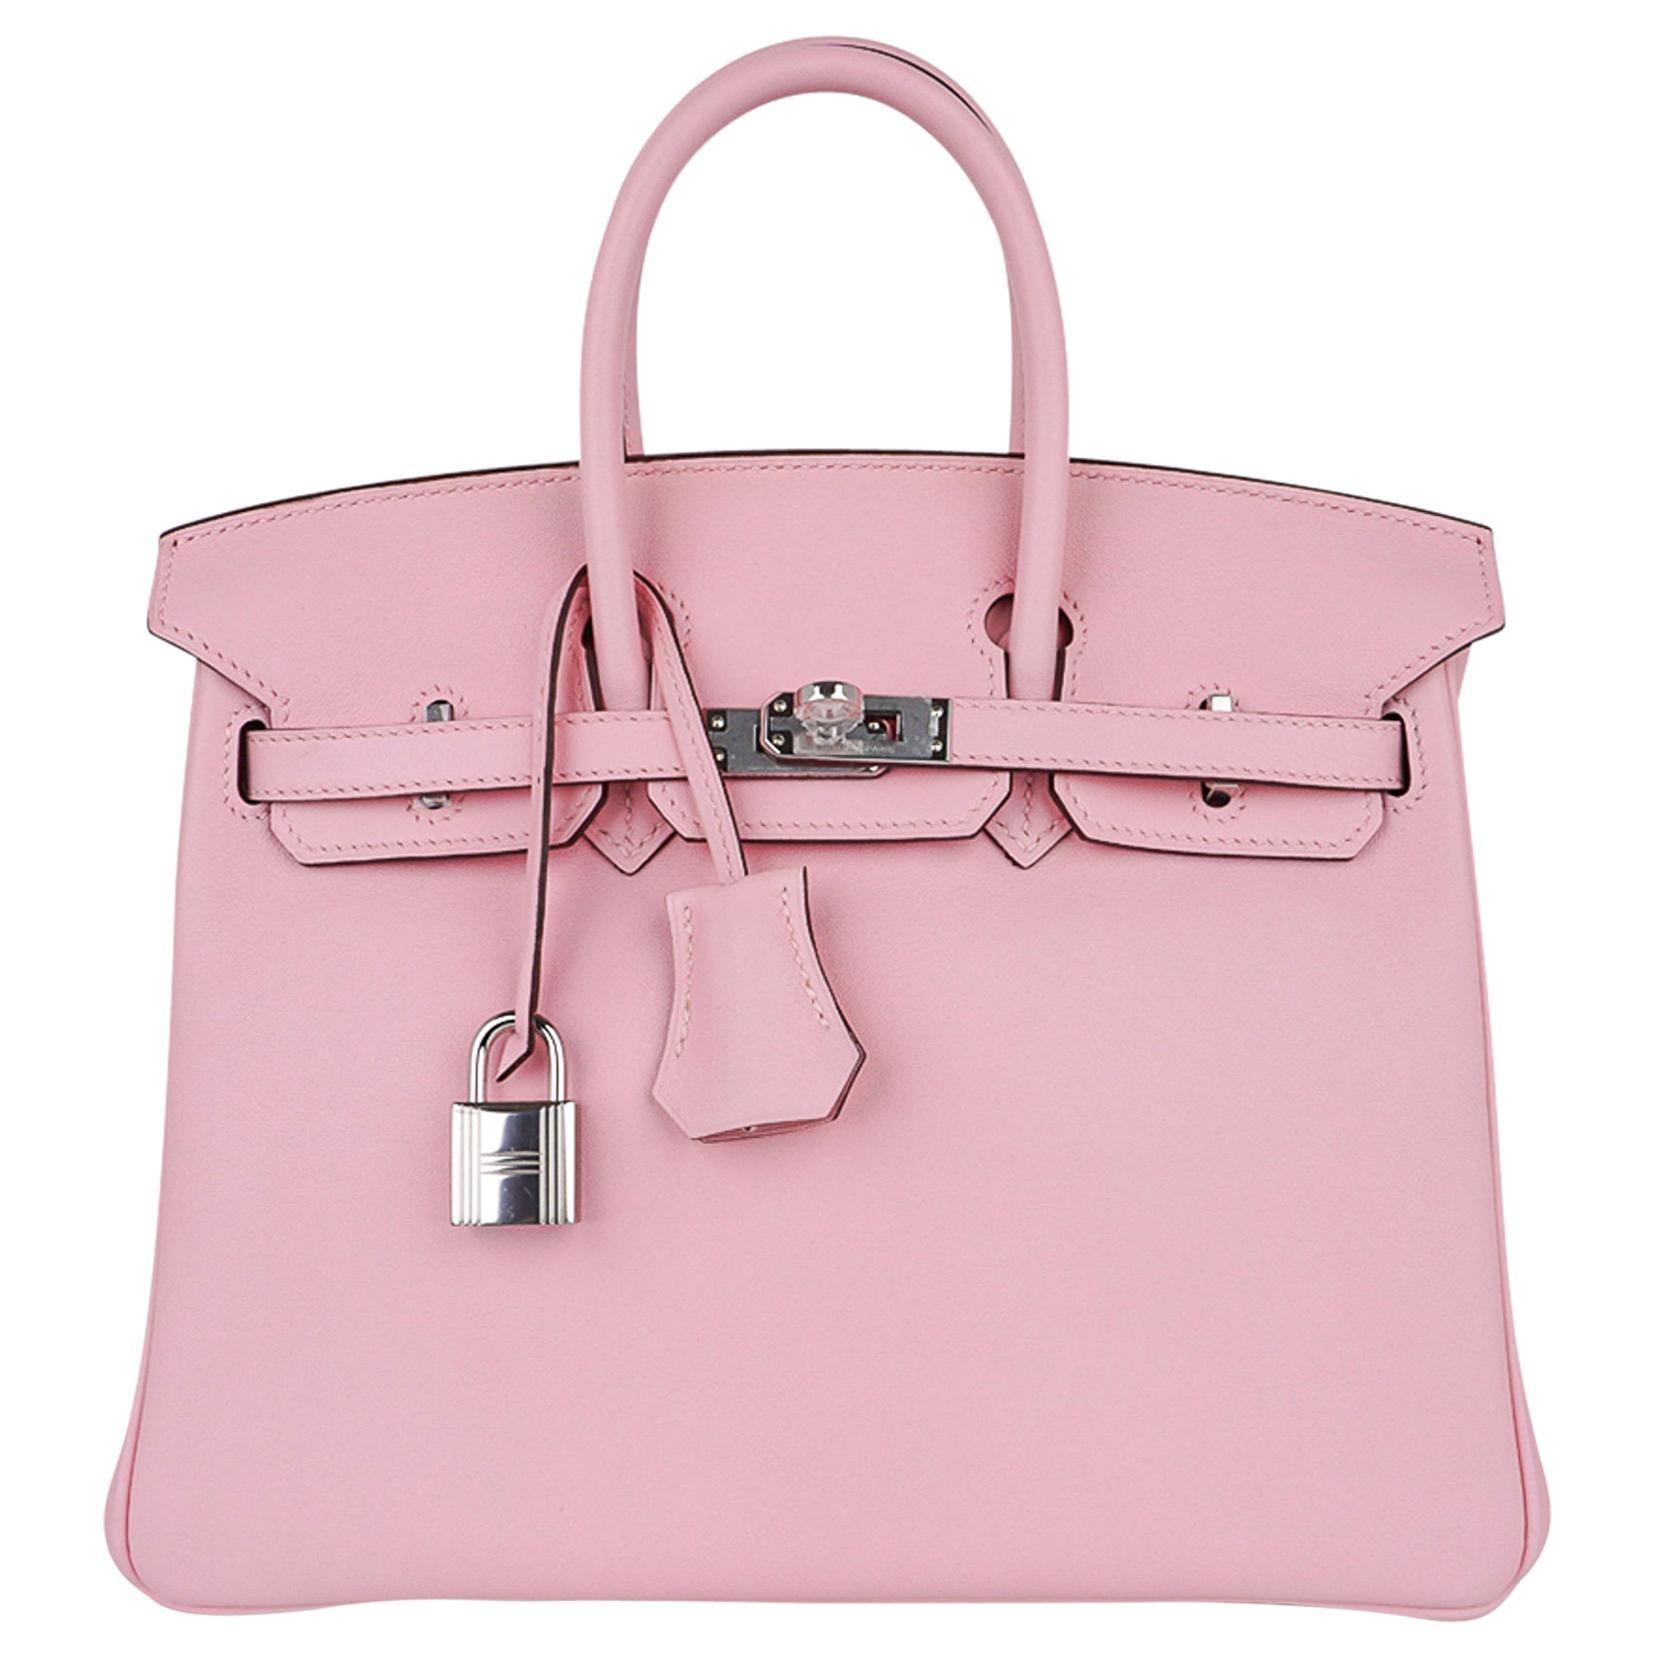 Hermes Birkin 25 Bag Rose Sakura Palladium Hardware Swift Leather Rare